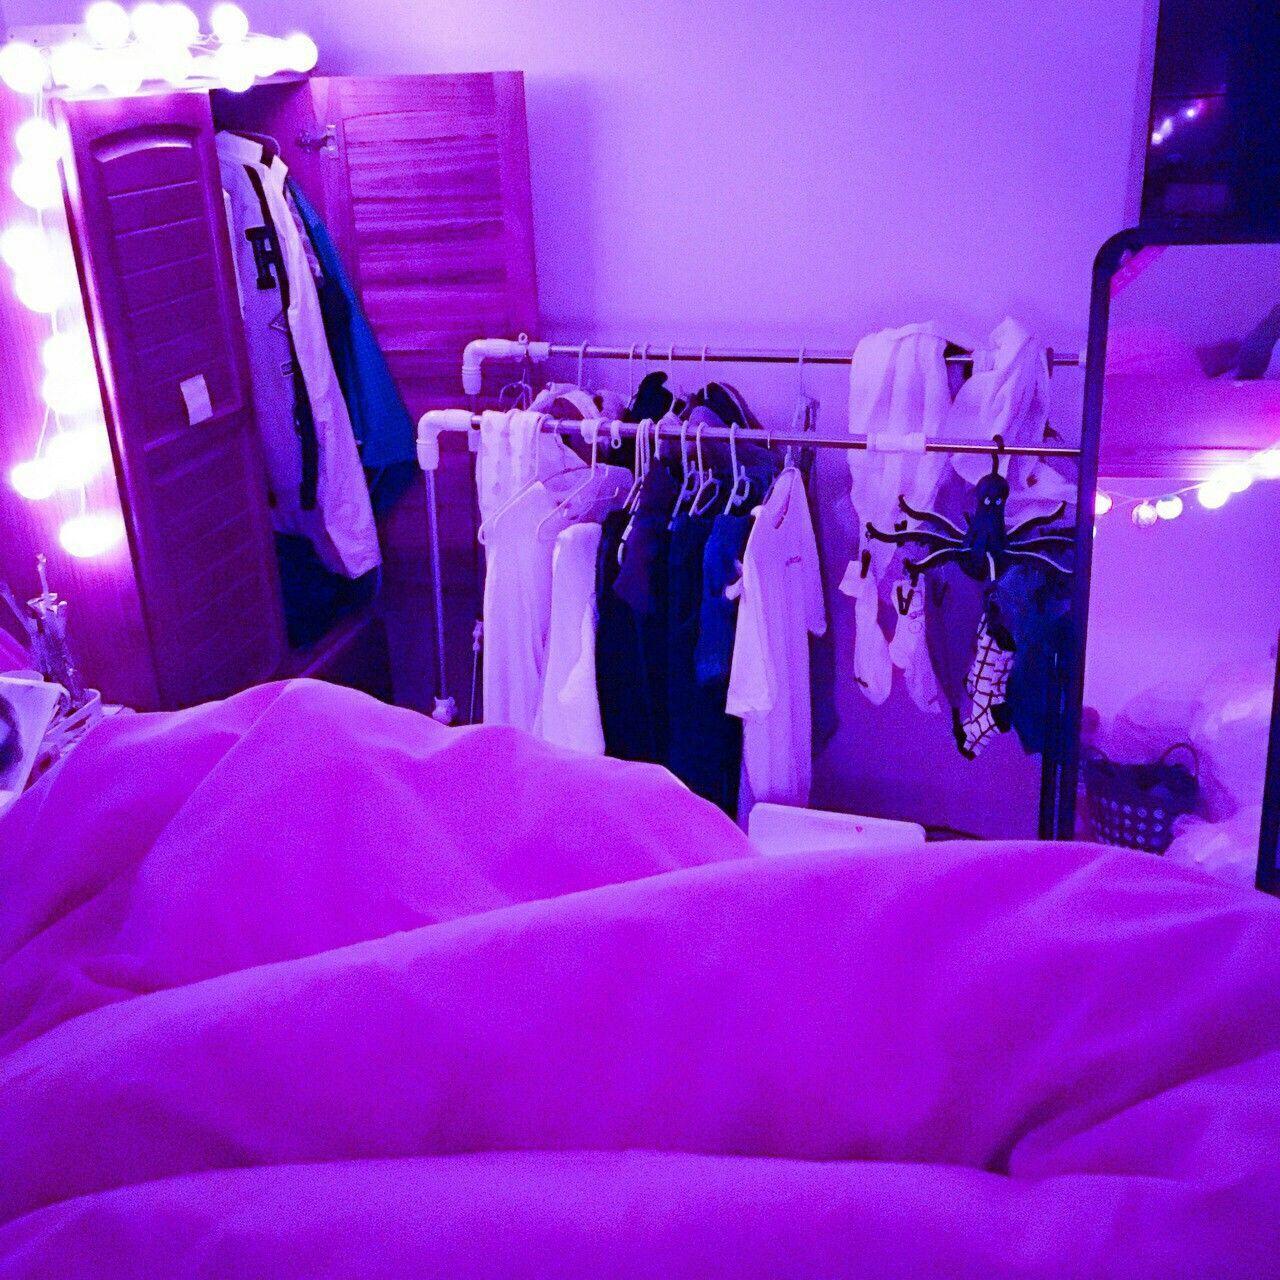 Vaporwave Room: warm glow // light // photography // cool ...